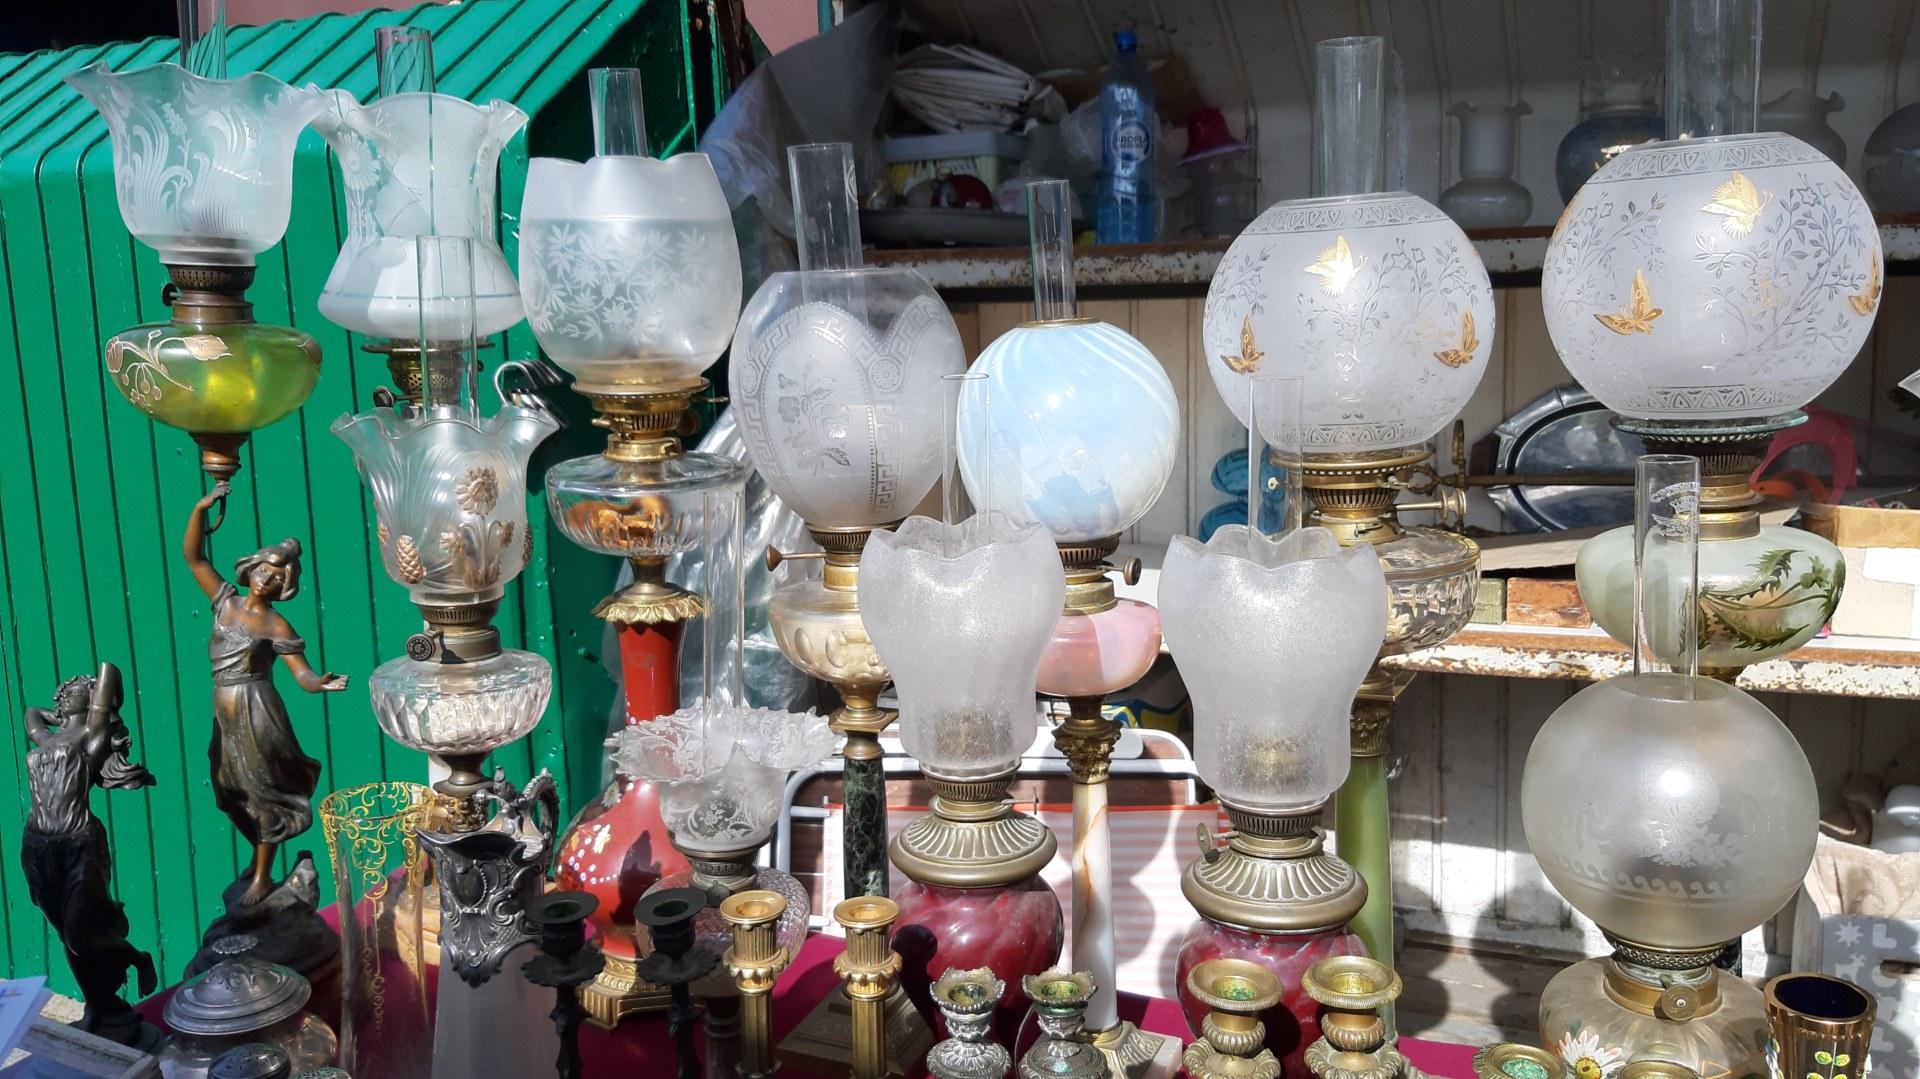 Lampy z kolekcji pana Dariusza.